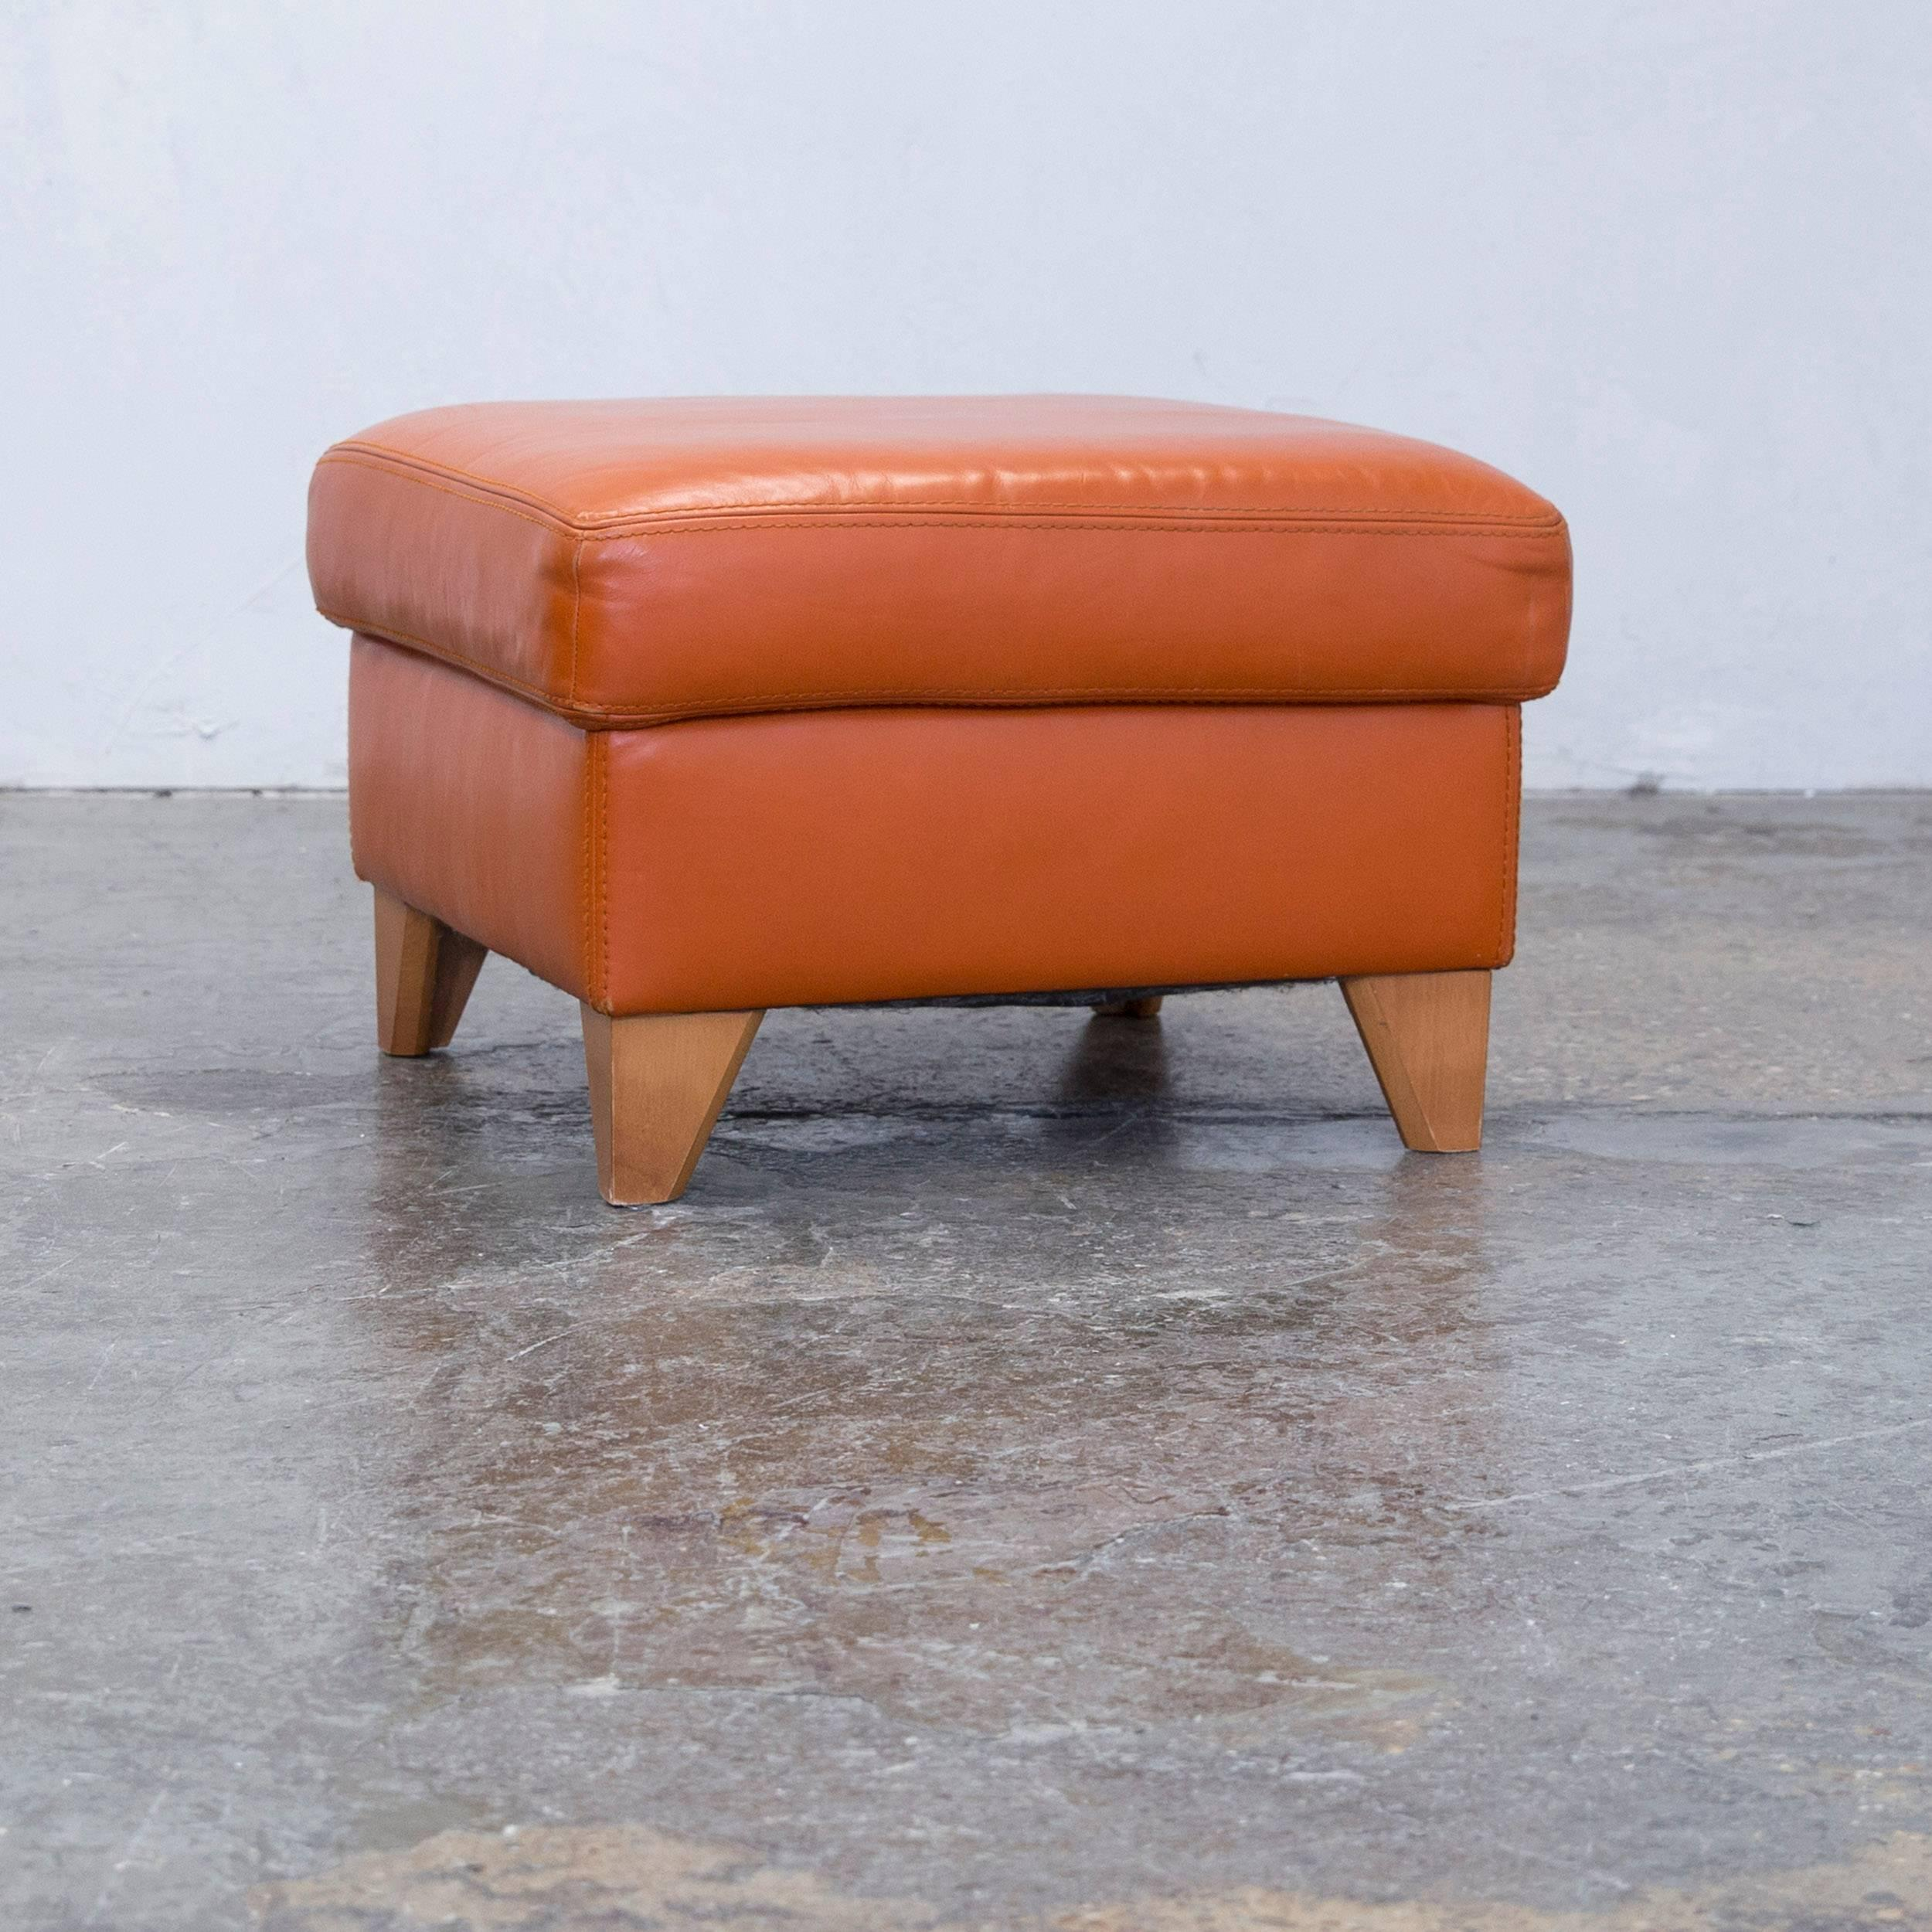 machalke sofa kaufen top machalke ledersofa fantastisch machalke sofa manolito leder. Black Bedroom Furniture Sets. Home Design Ideas